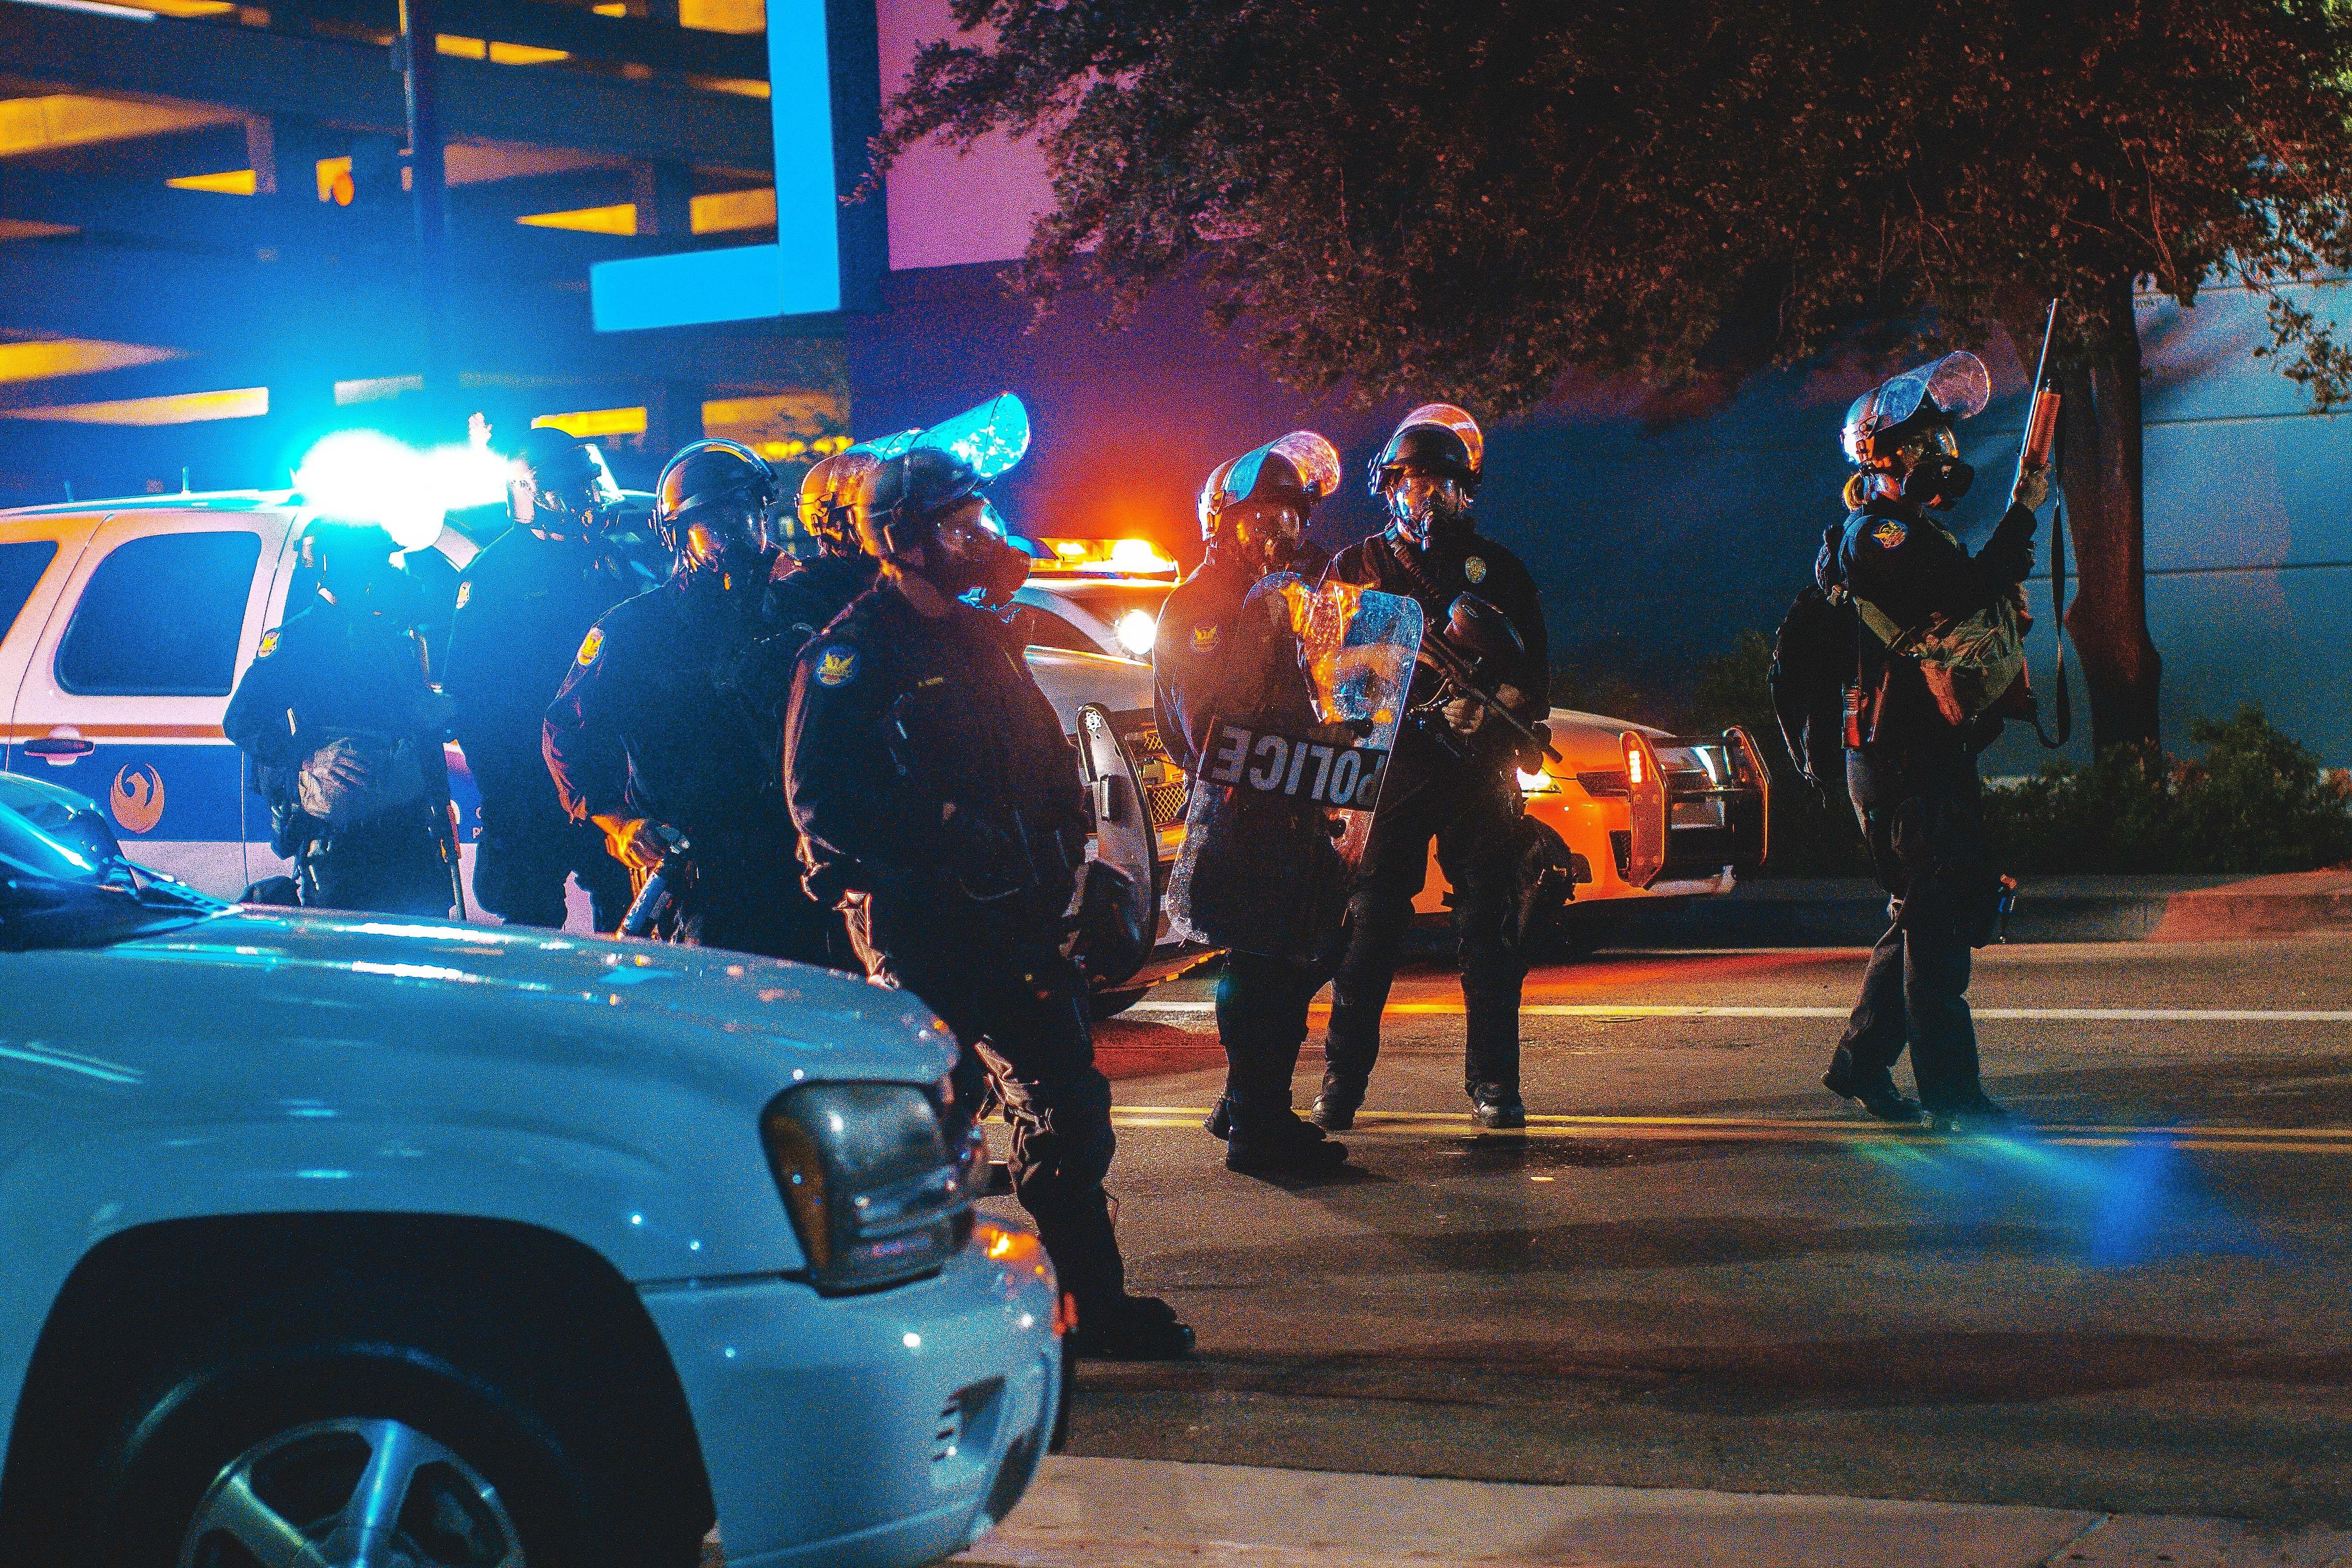 Oregon has a Fentanyl Problem, According to Law Enforcement